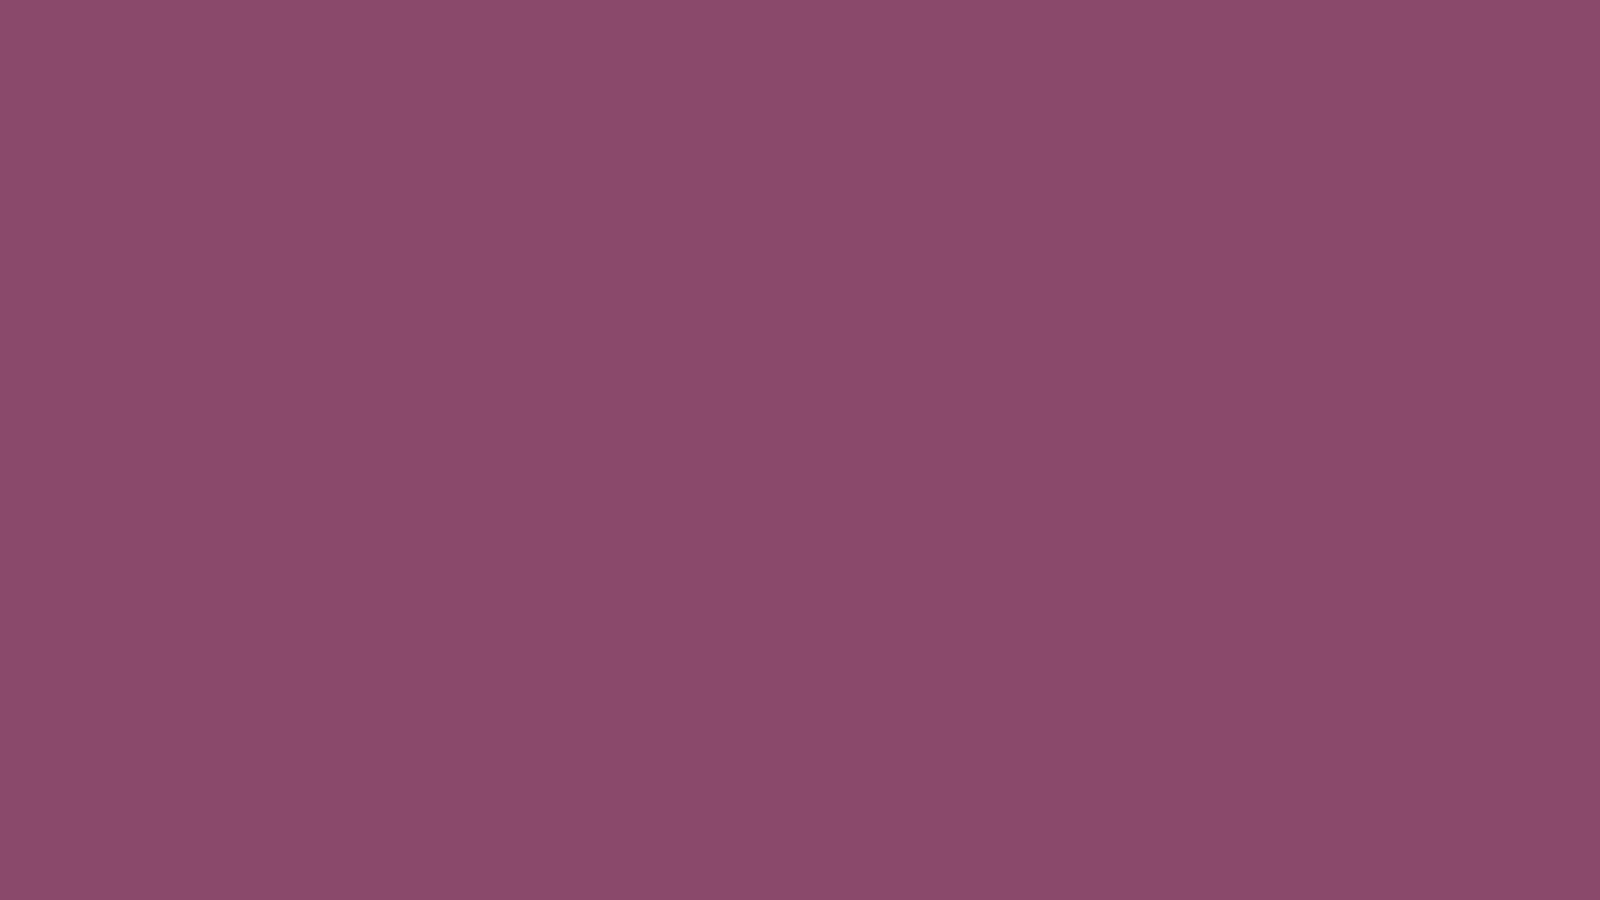 1600x900 Twilight Lavender Solid Color Background